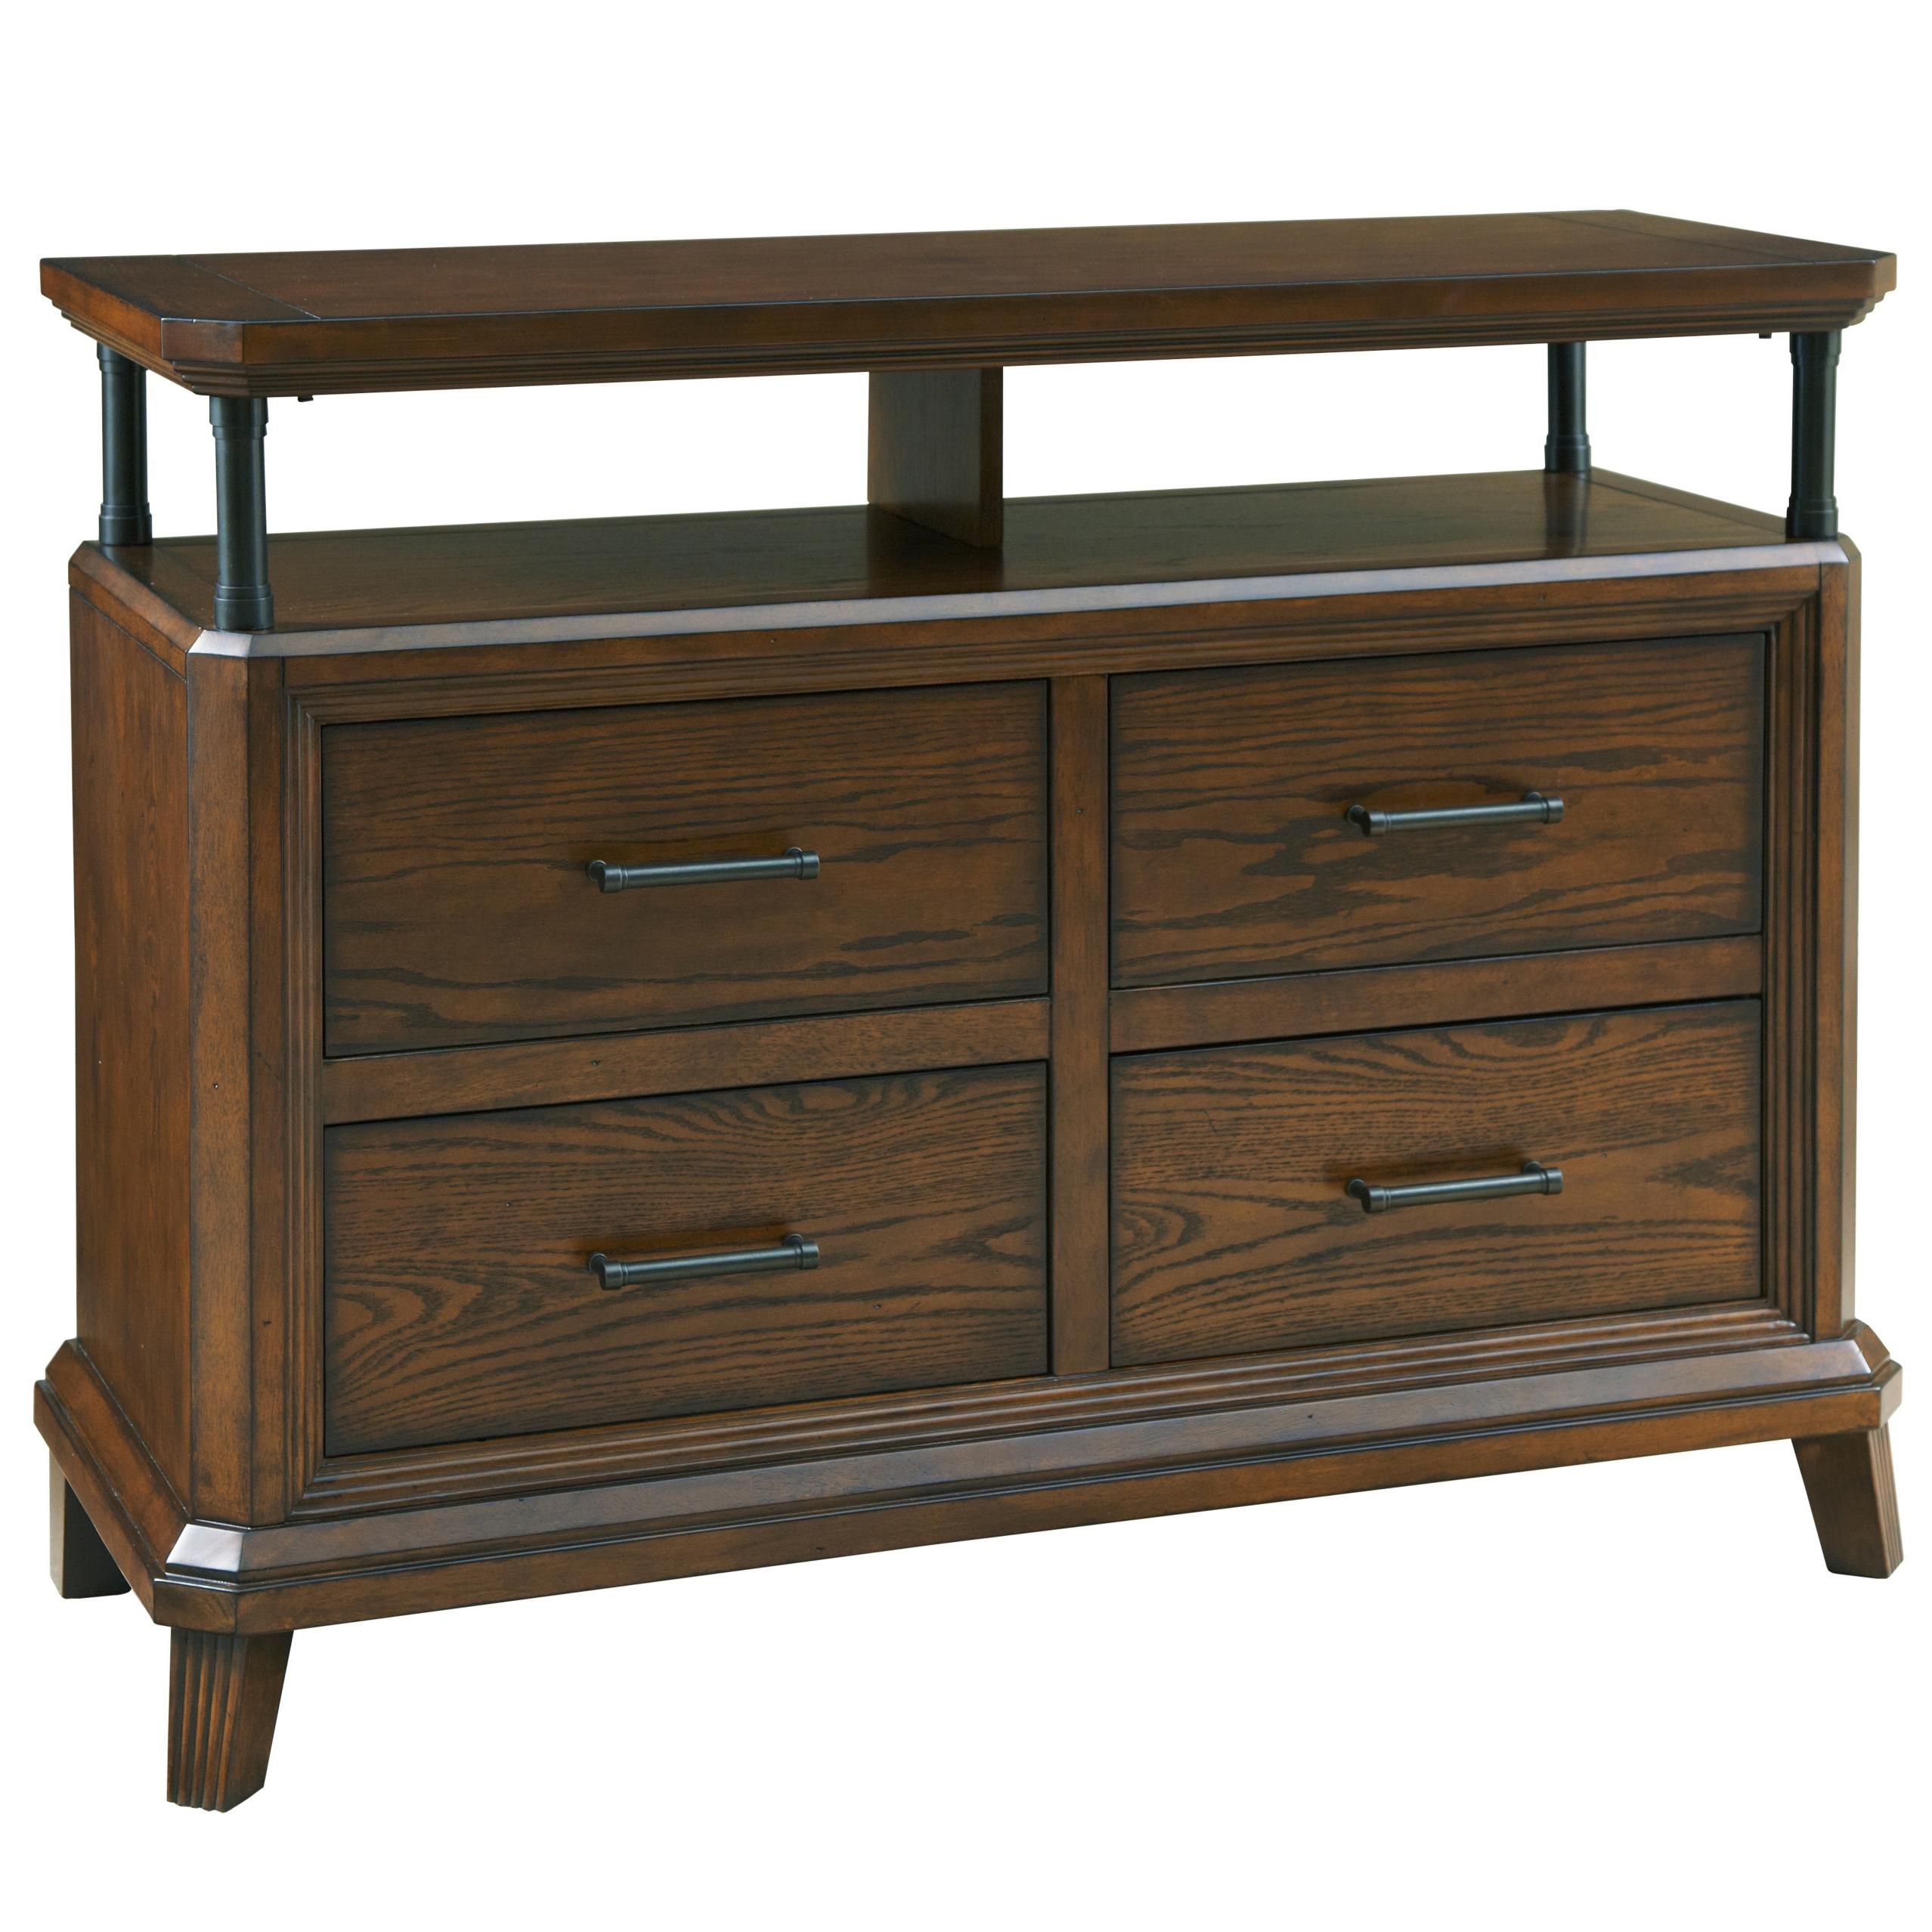 Broyhill Furniture Estes Park 4 Drawer Media Chest | FMG ...